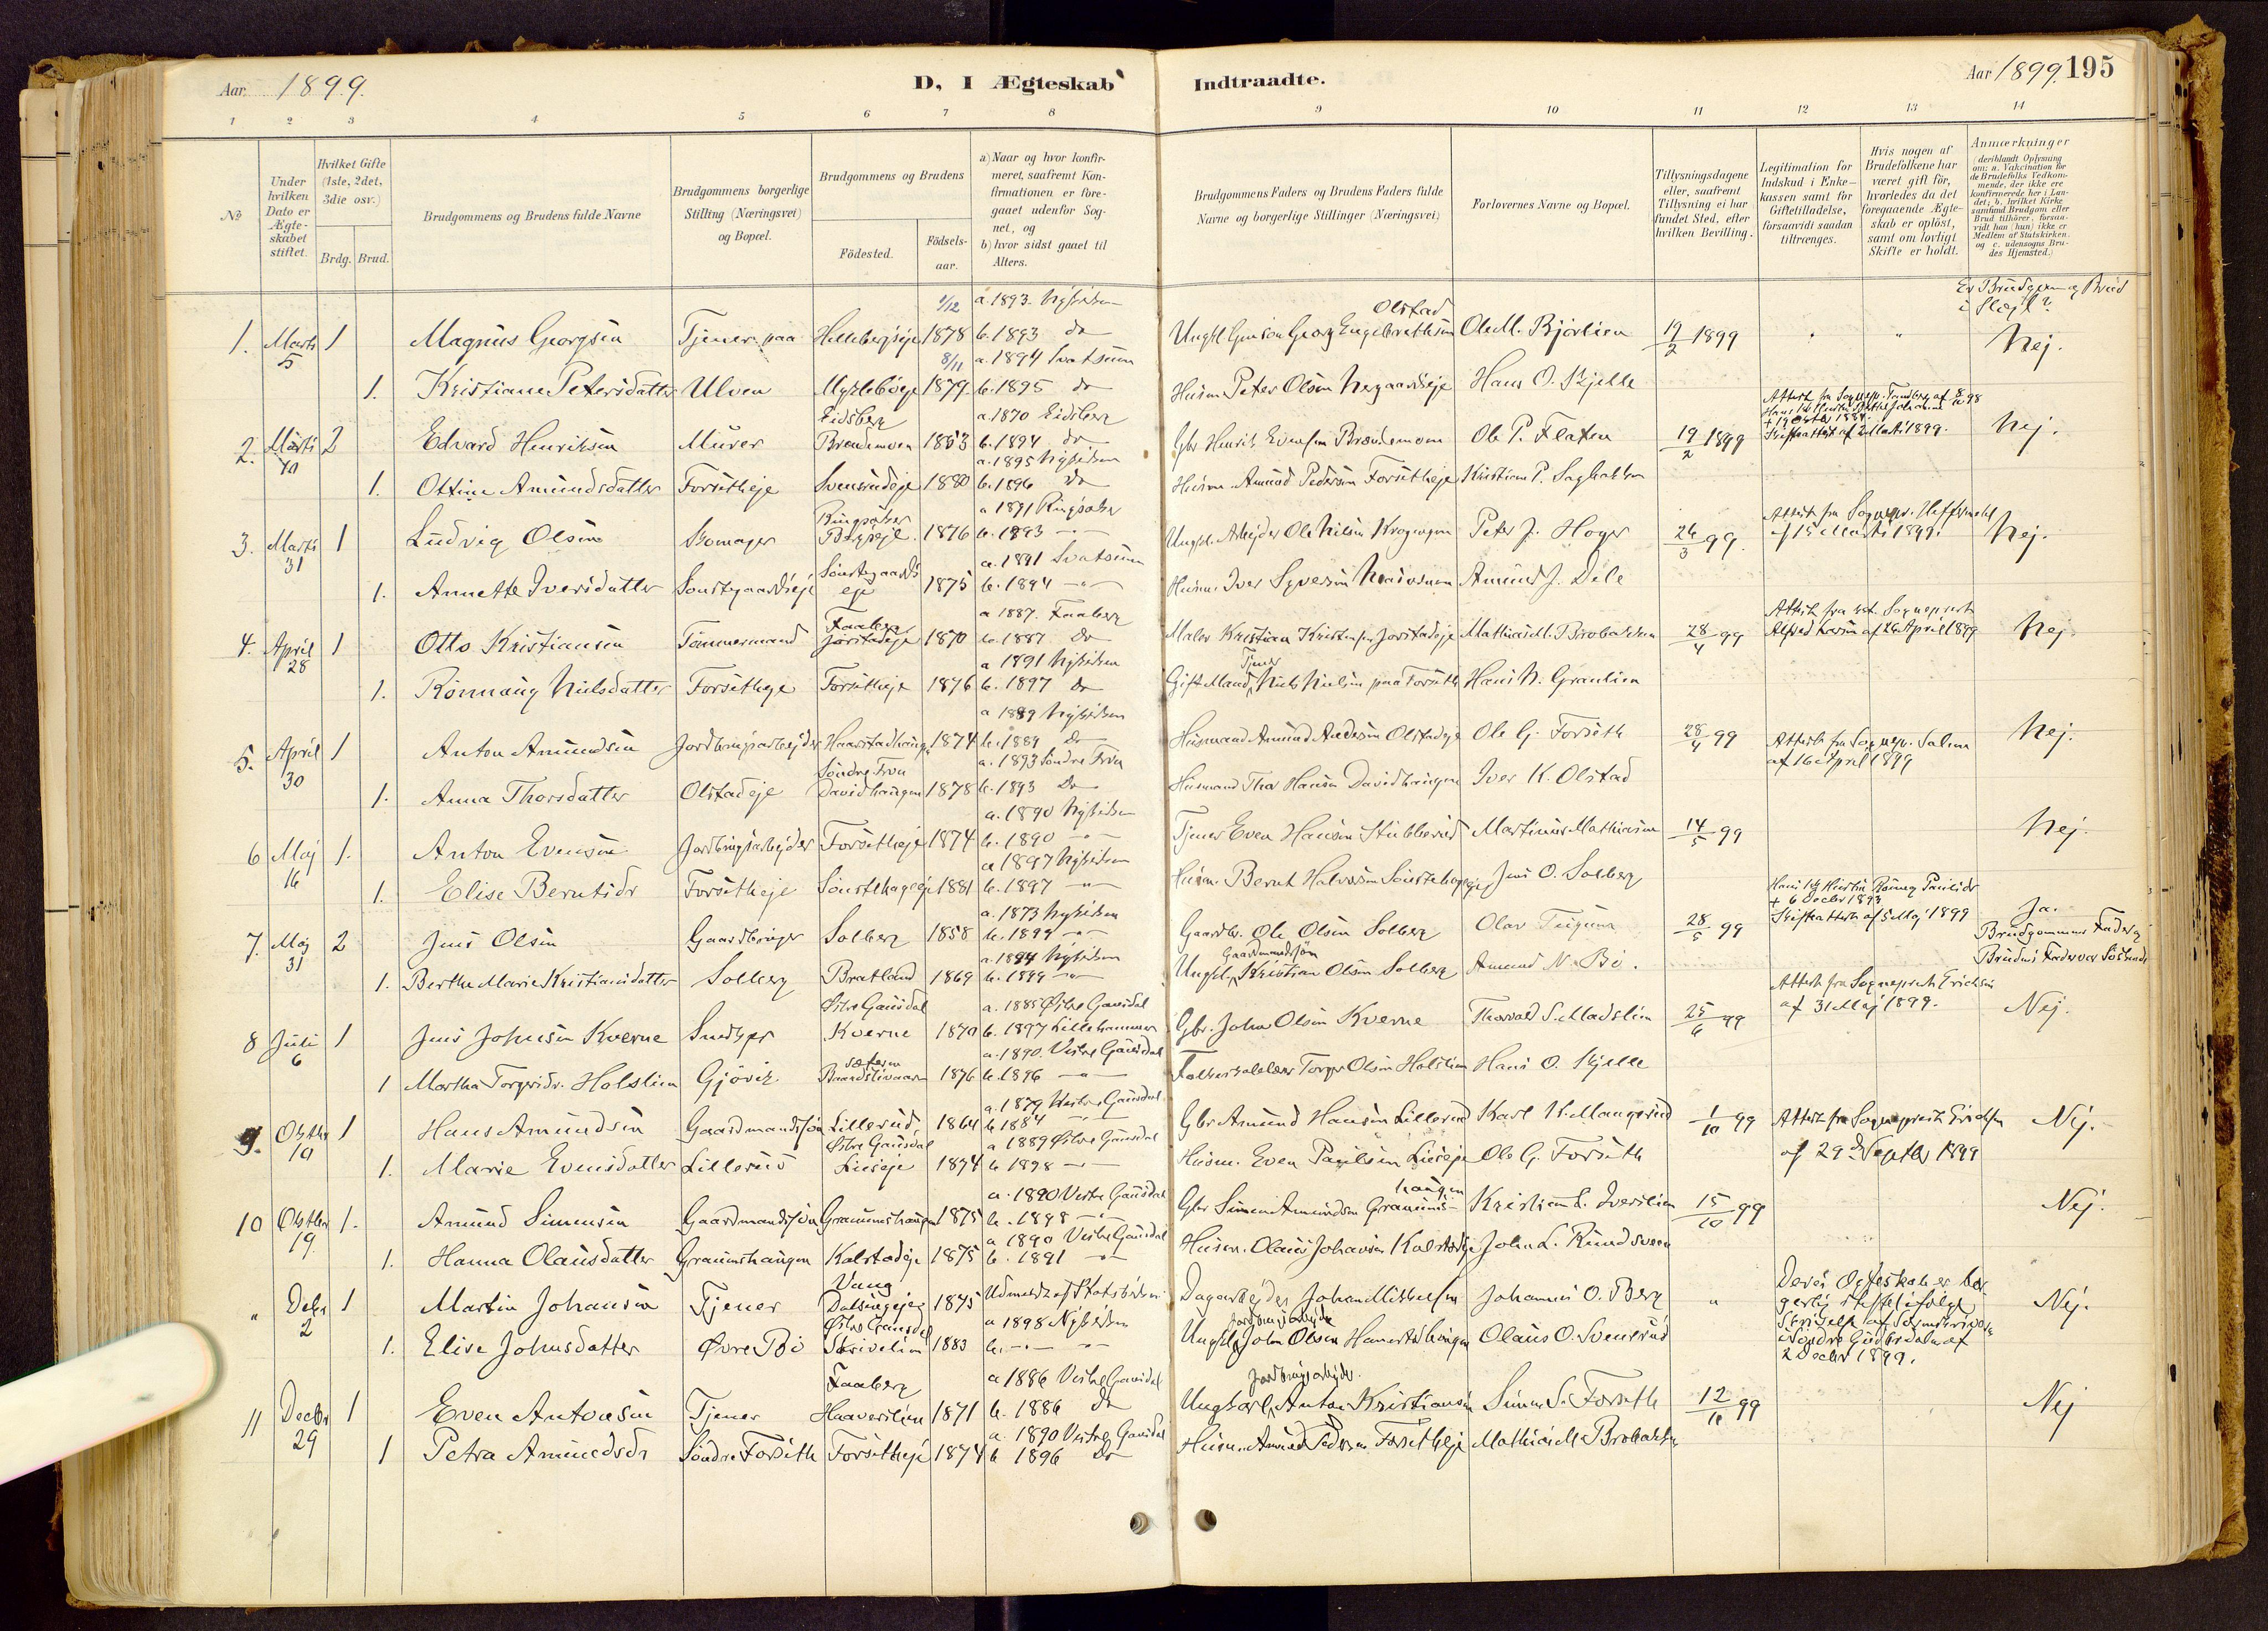 SAH, Vestre Gausdal prestekontor, Ministerialbok nr. 1, 1887-1914, s. 195